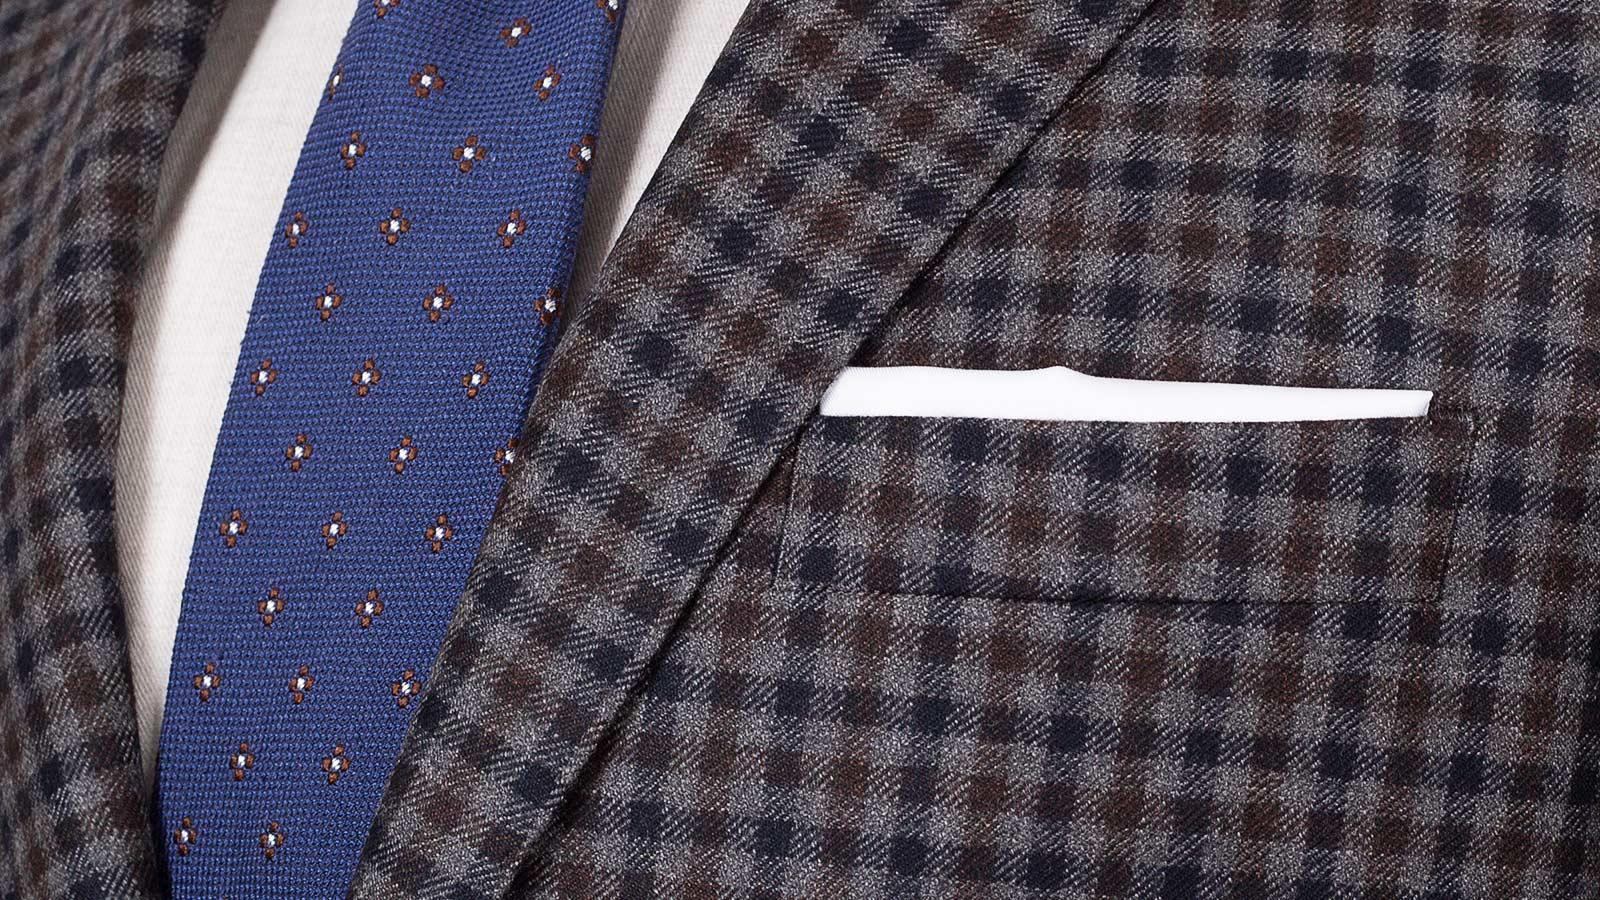 Grey Guncheck Wool & Cashmere Suit - slider image 1